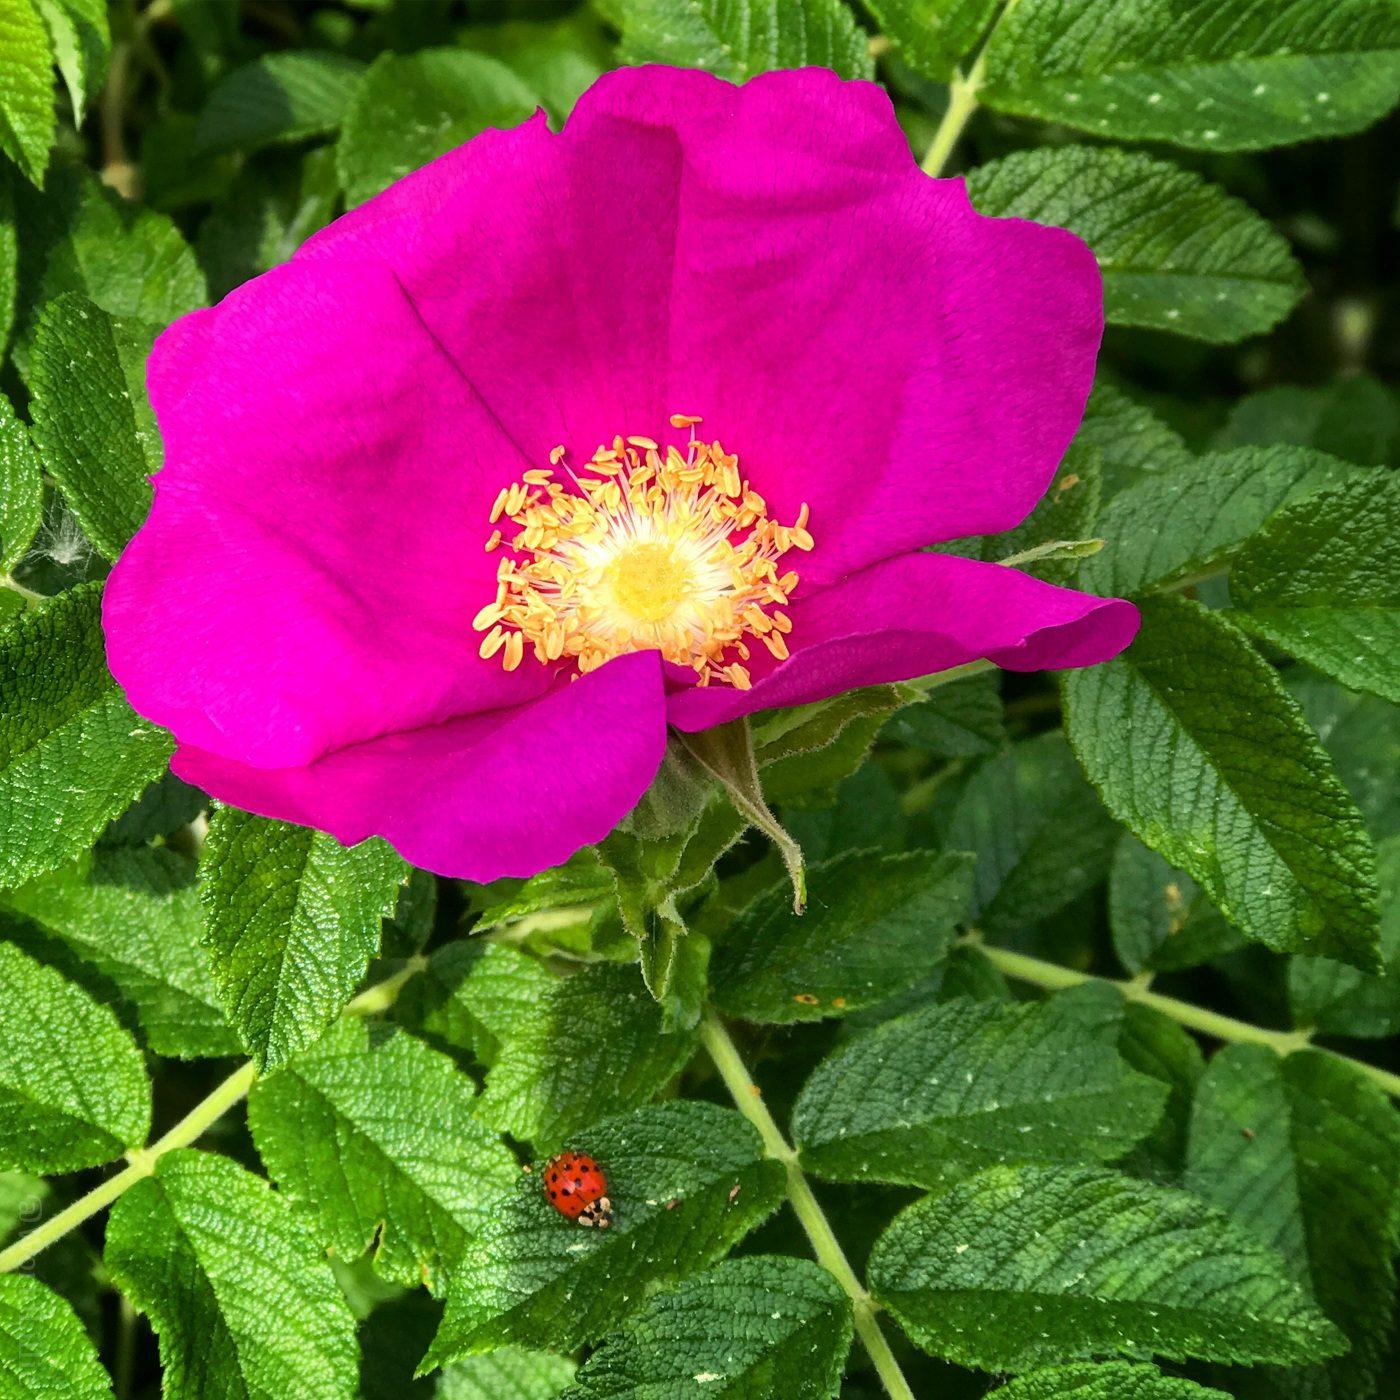 Pink magenta flower and ladybug